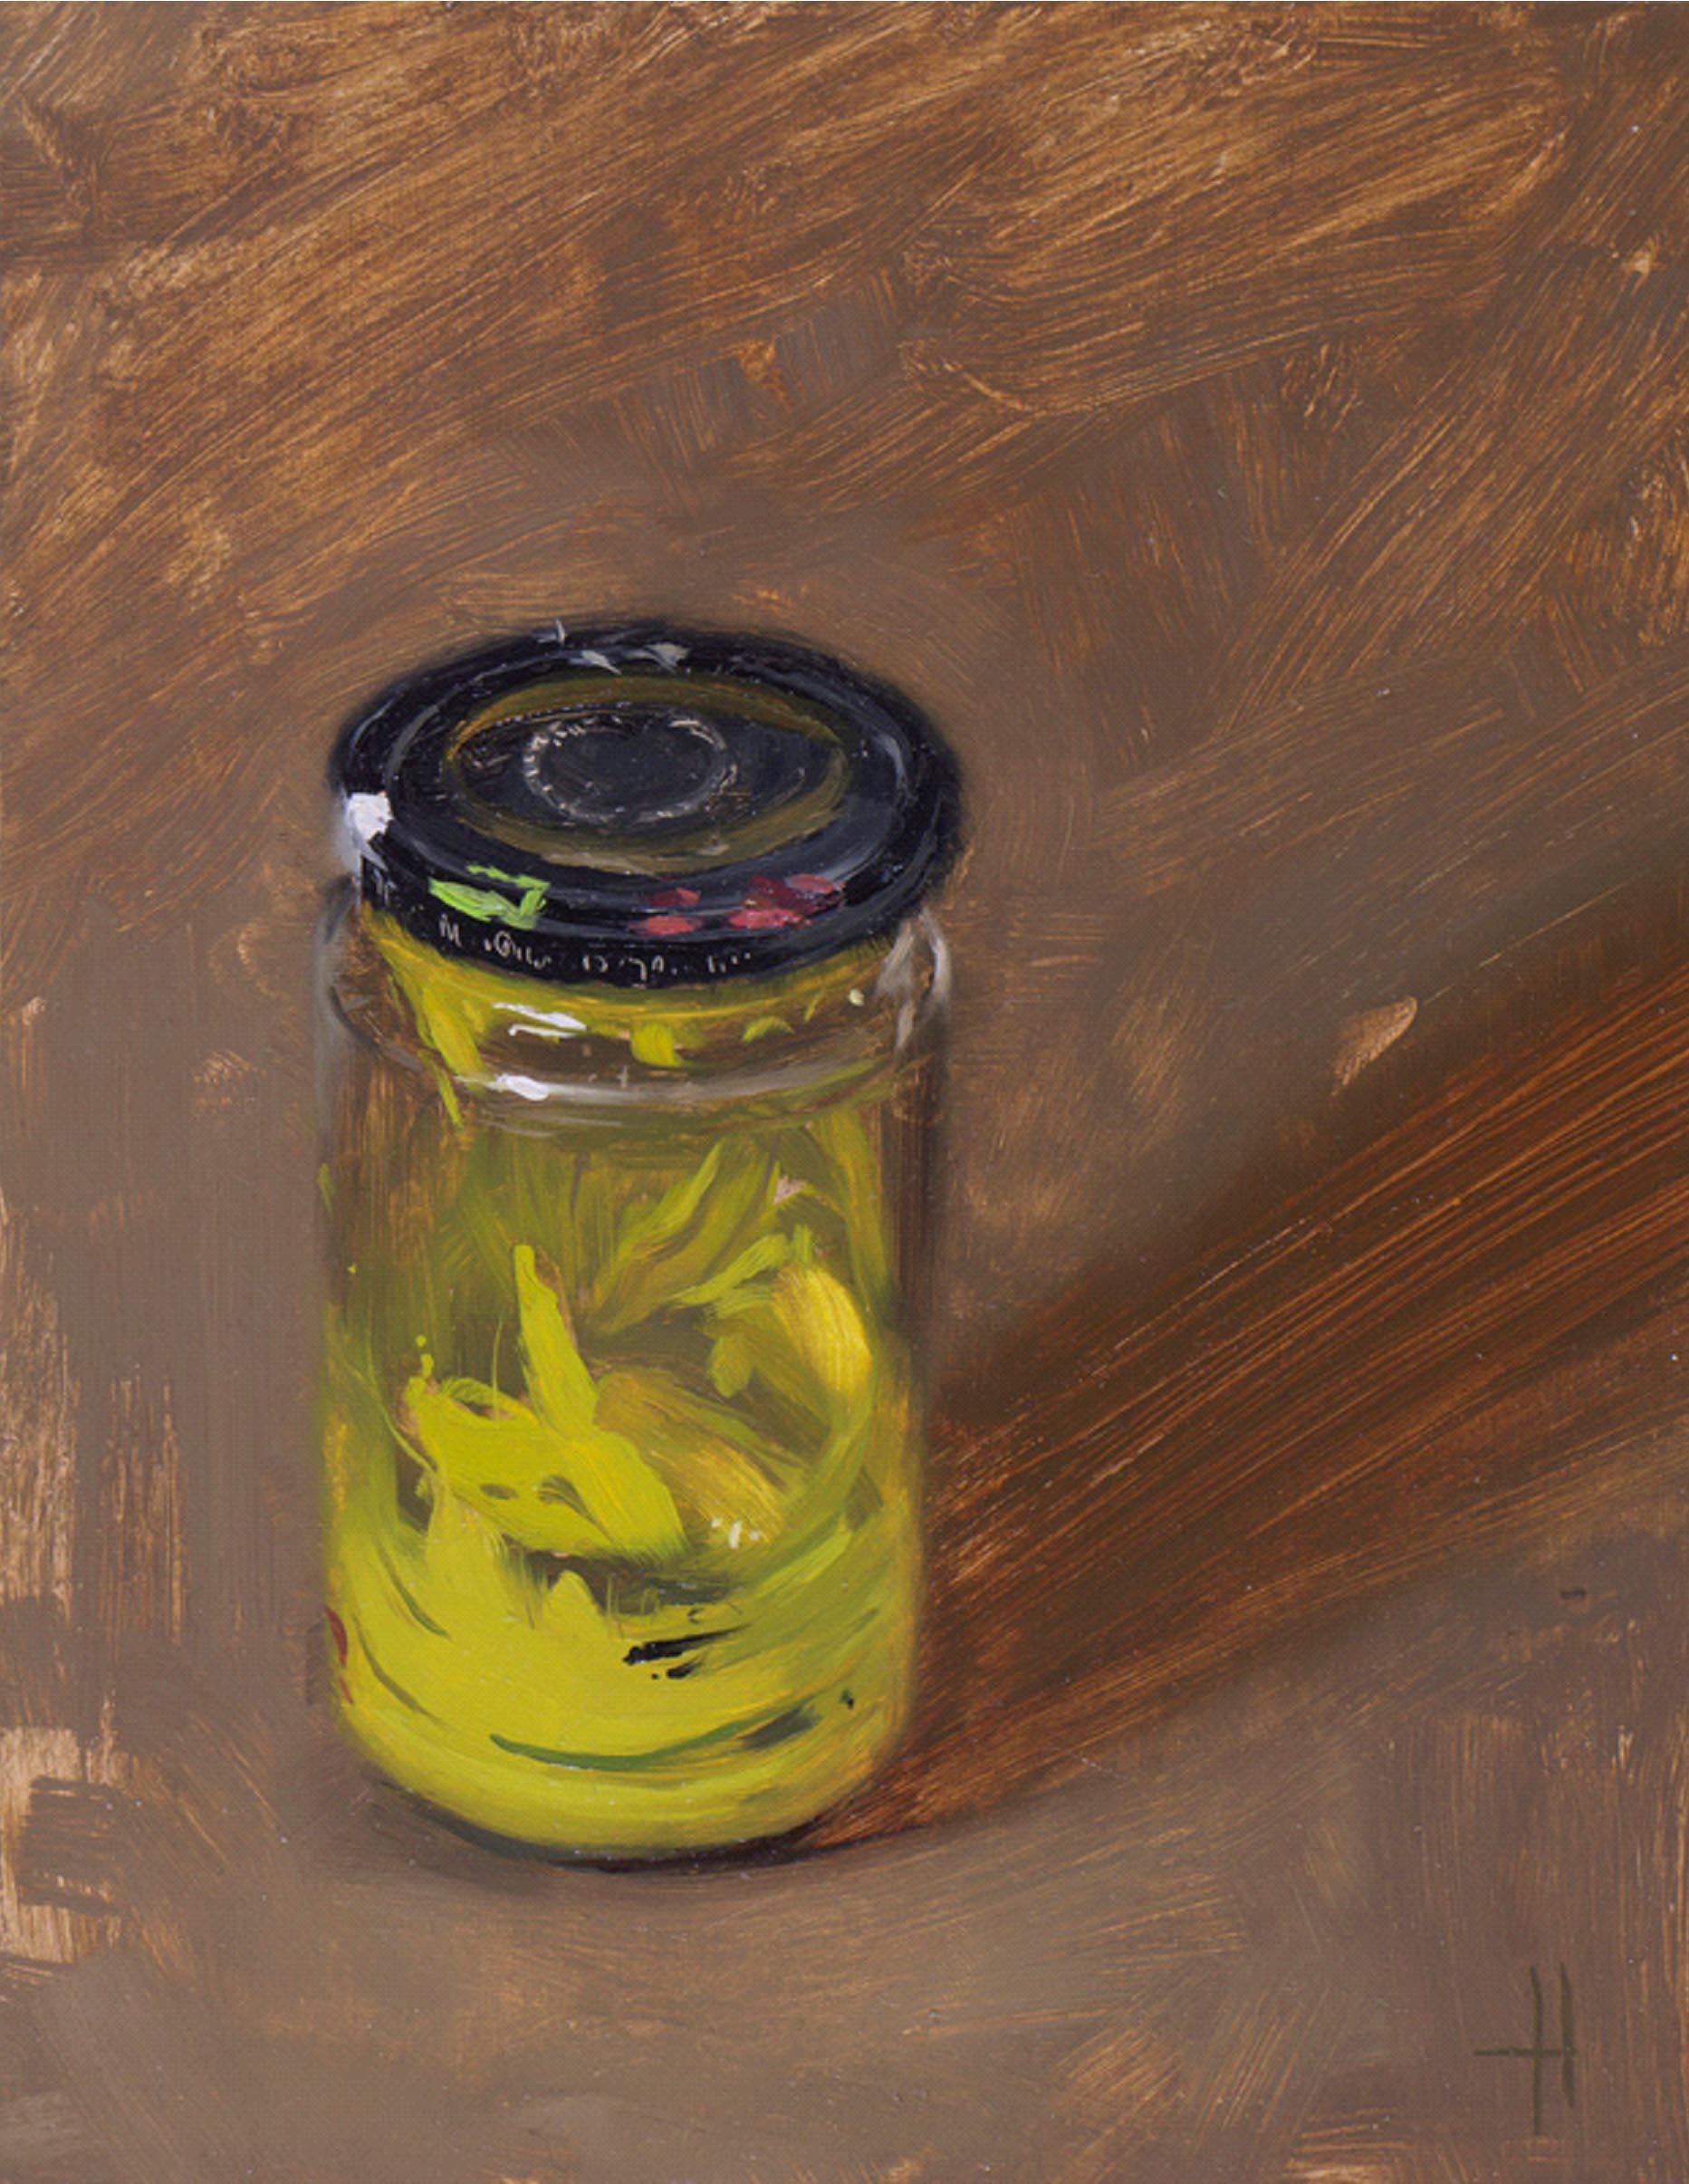 Tom Hughes Jar, Oil on Board 23 x 17 cm